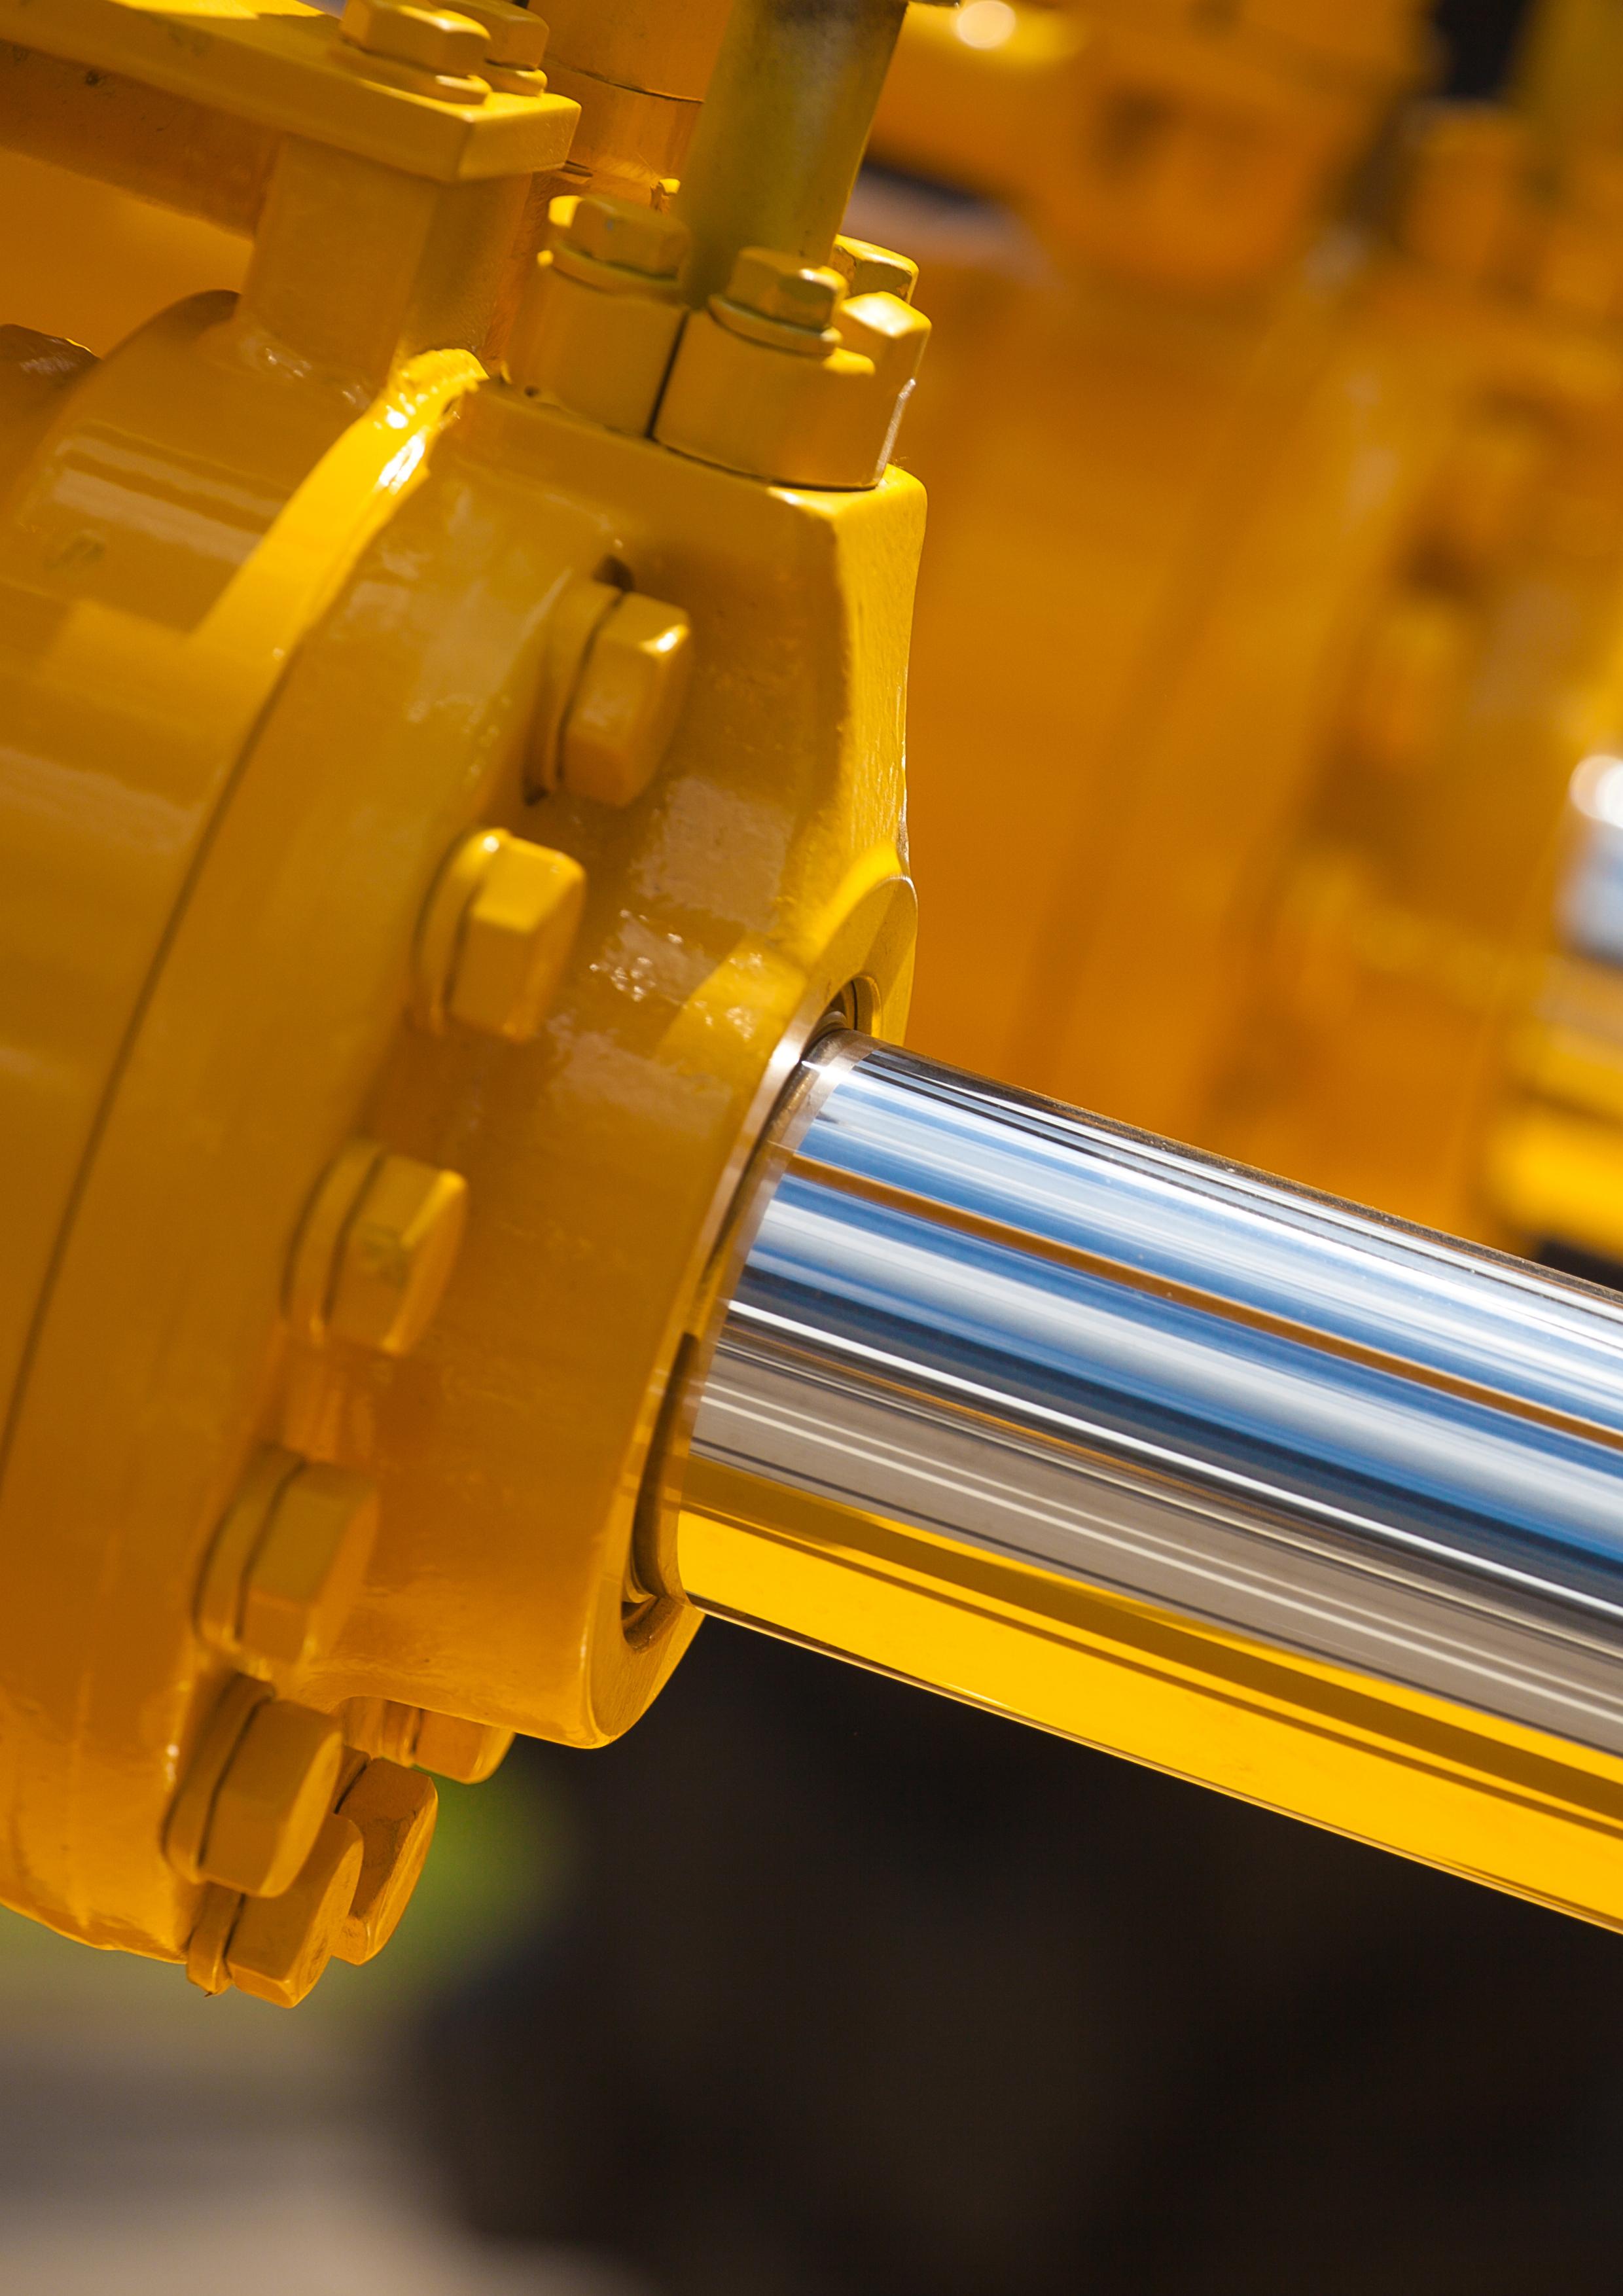 Fluid power systems hydraulics and pneumatics training